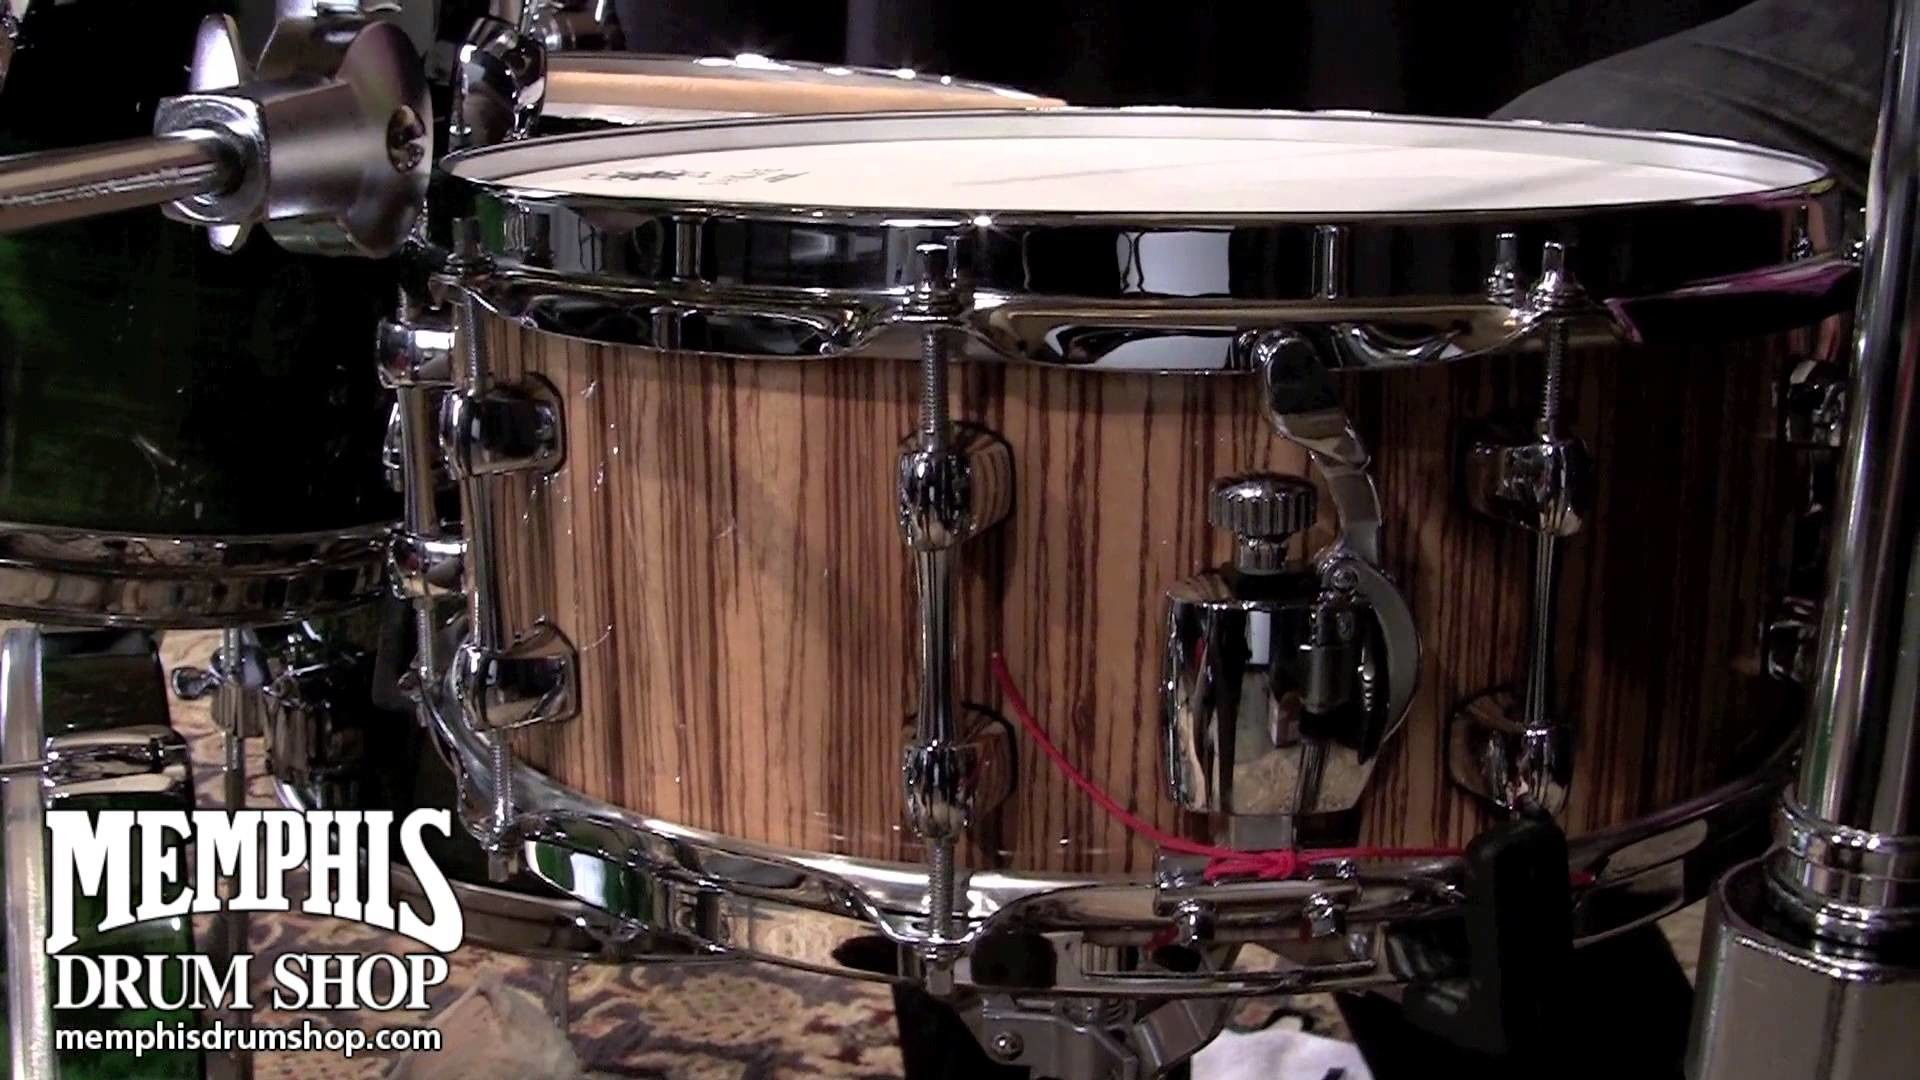 Res: 1920x1080, Sakae 14 x 5.5 Zebrawood/Mahogany Snare Drum - Played by Eric Harland